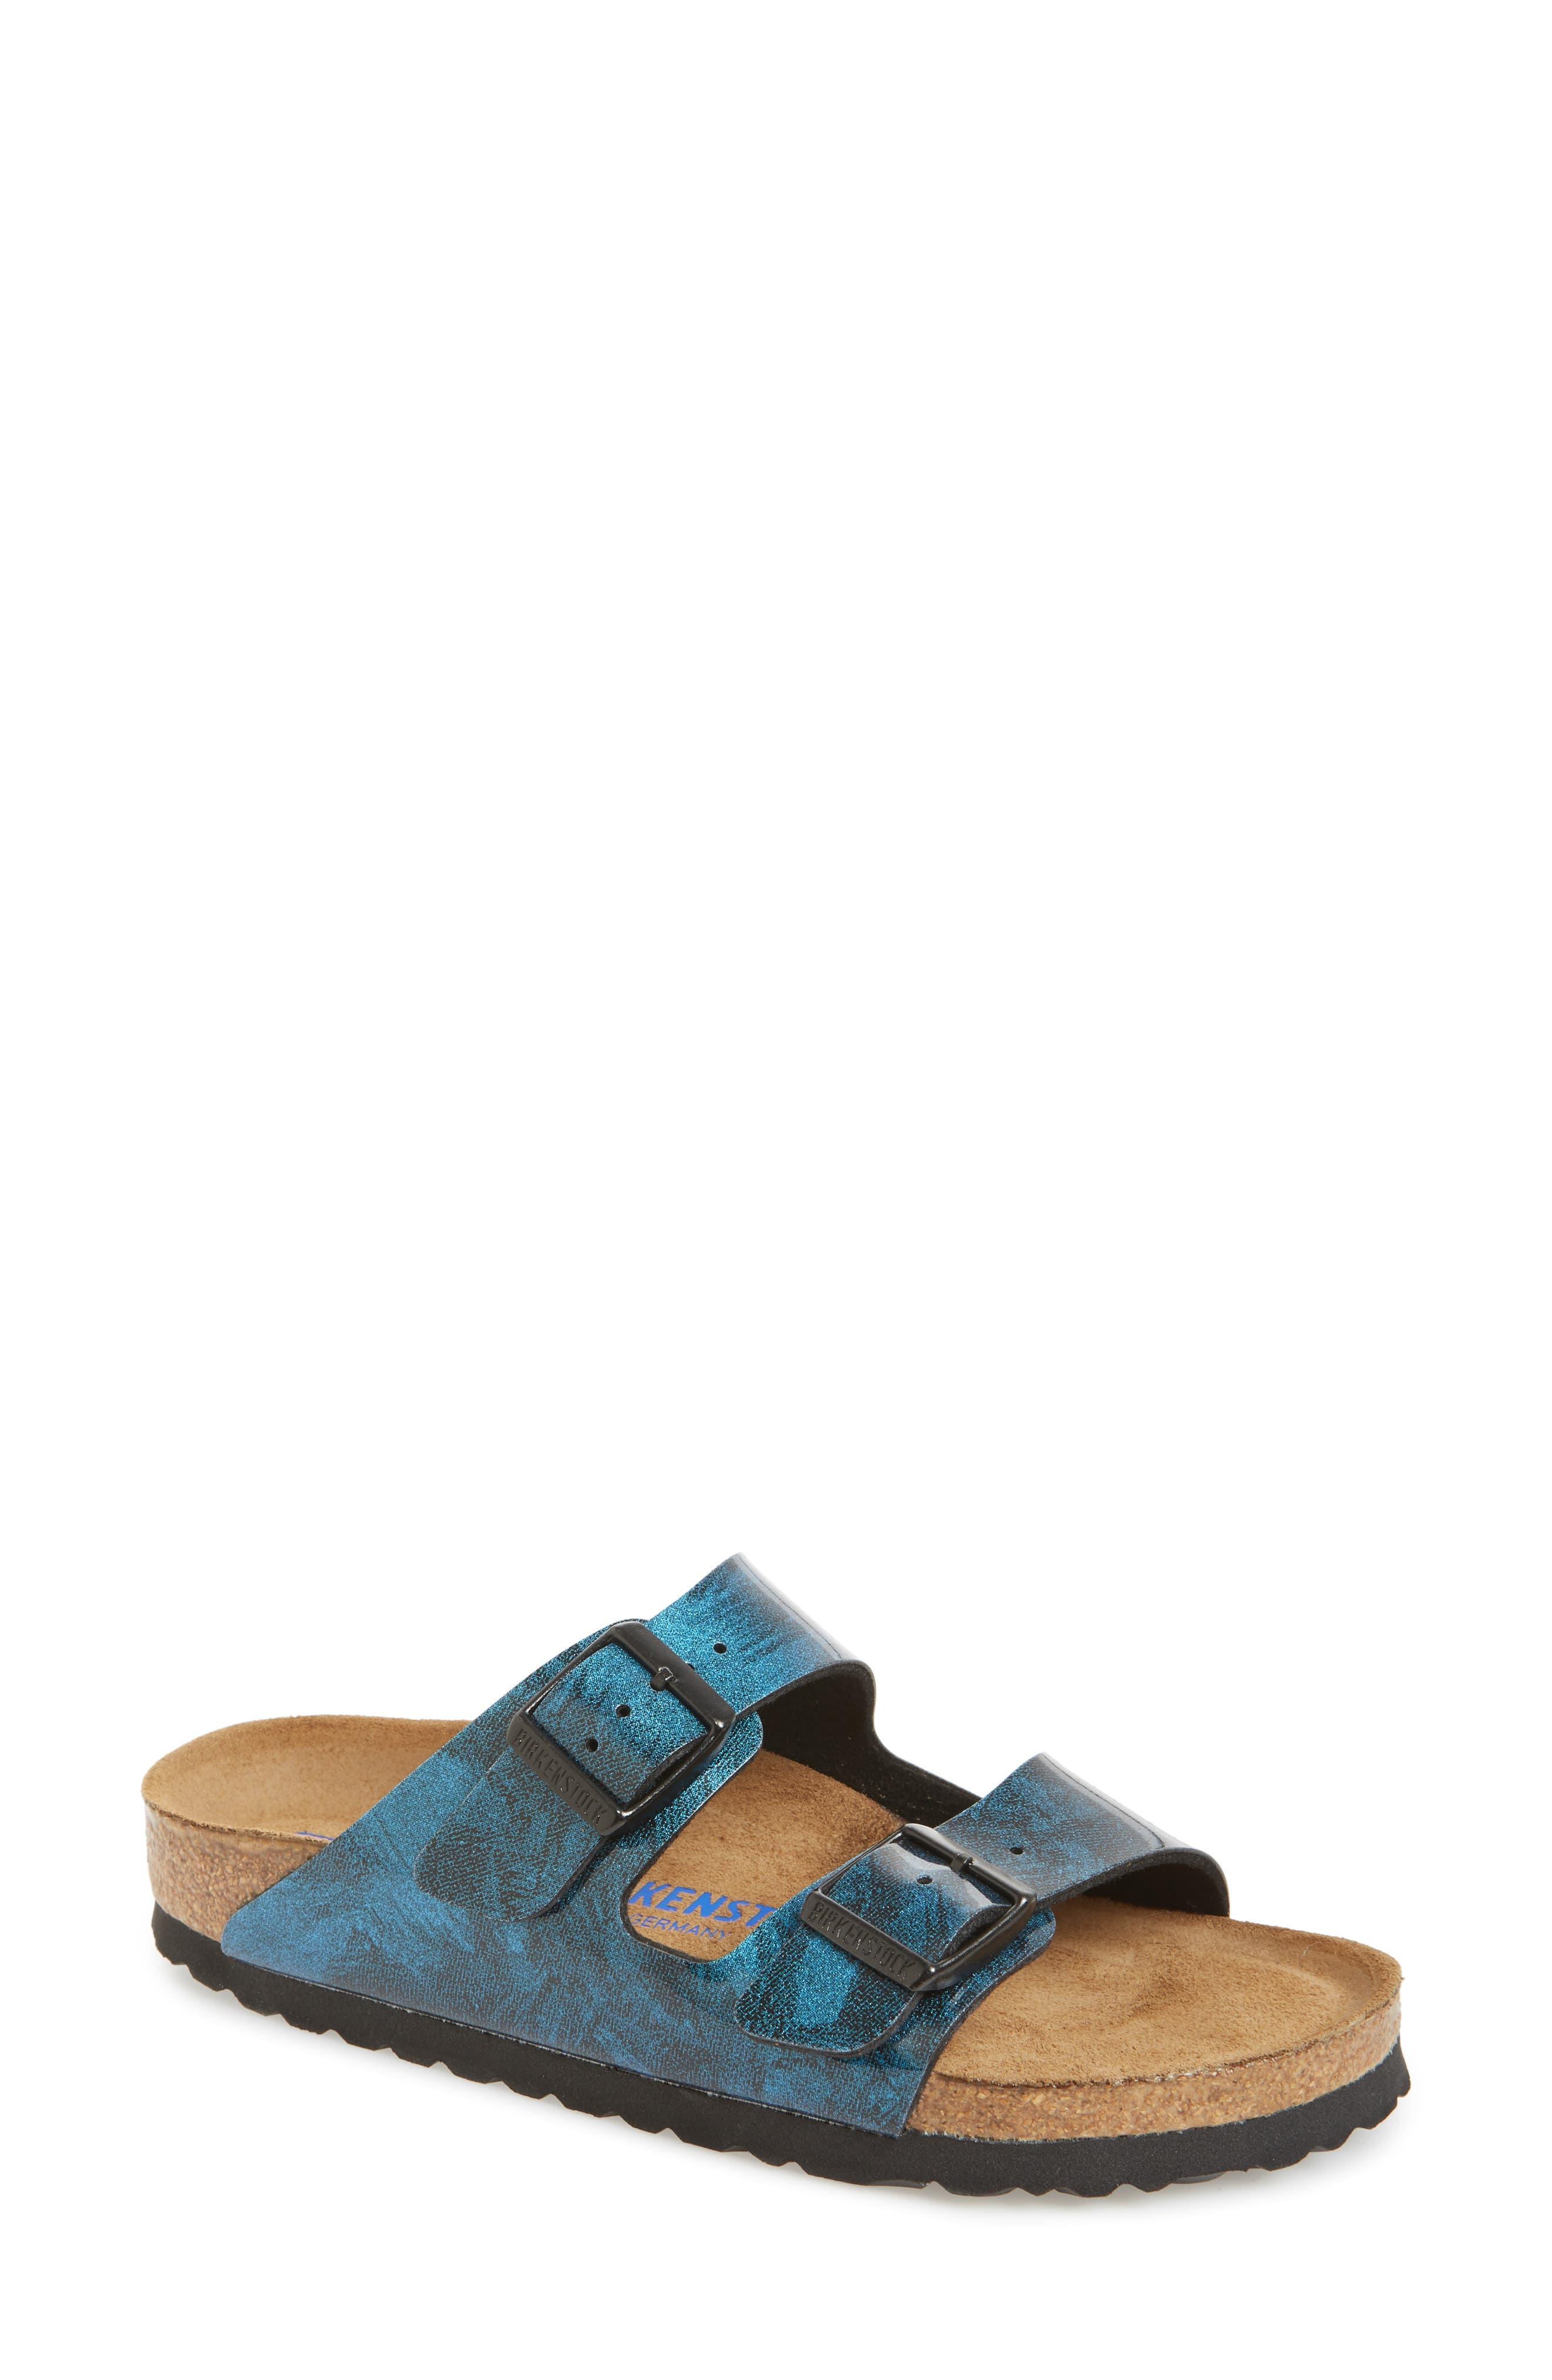 Arizona Birko-Flor Soft Footbed Sandal,                             Main thumbnail 1, color,                             MILKY WAY BLUE